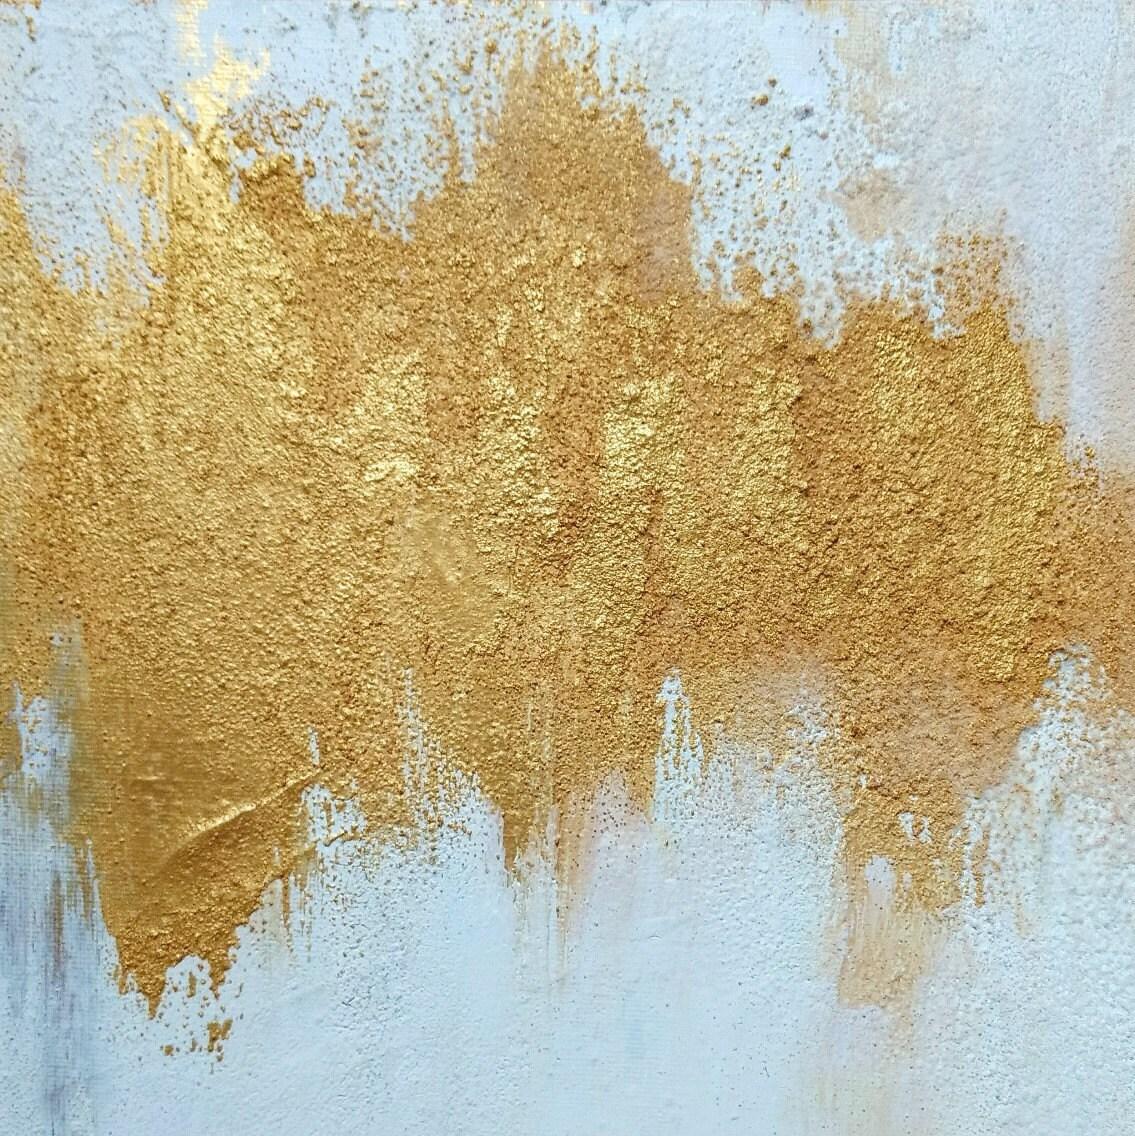 Abstract Acrylic Painting Set of Three Small Painting Wall Art